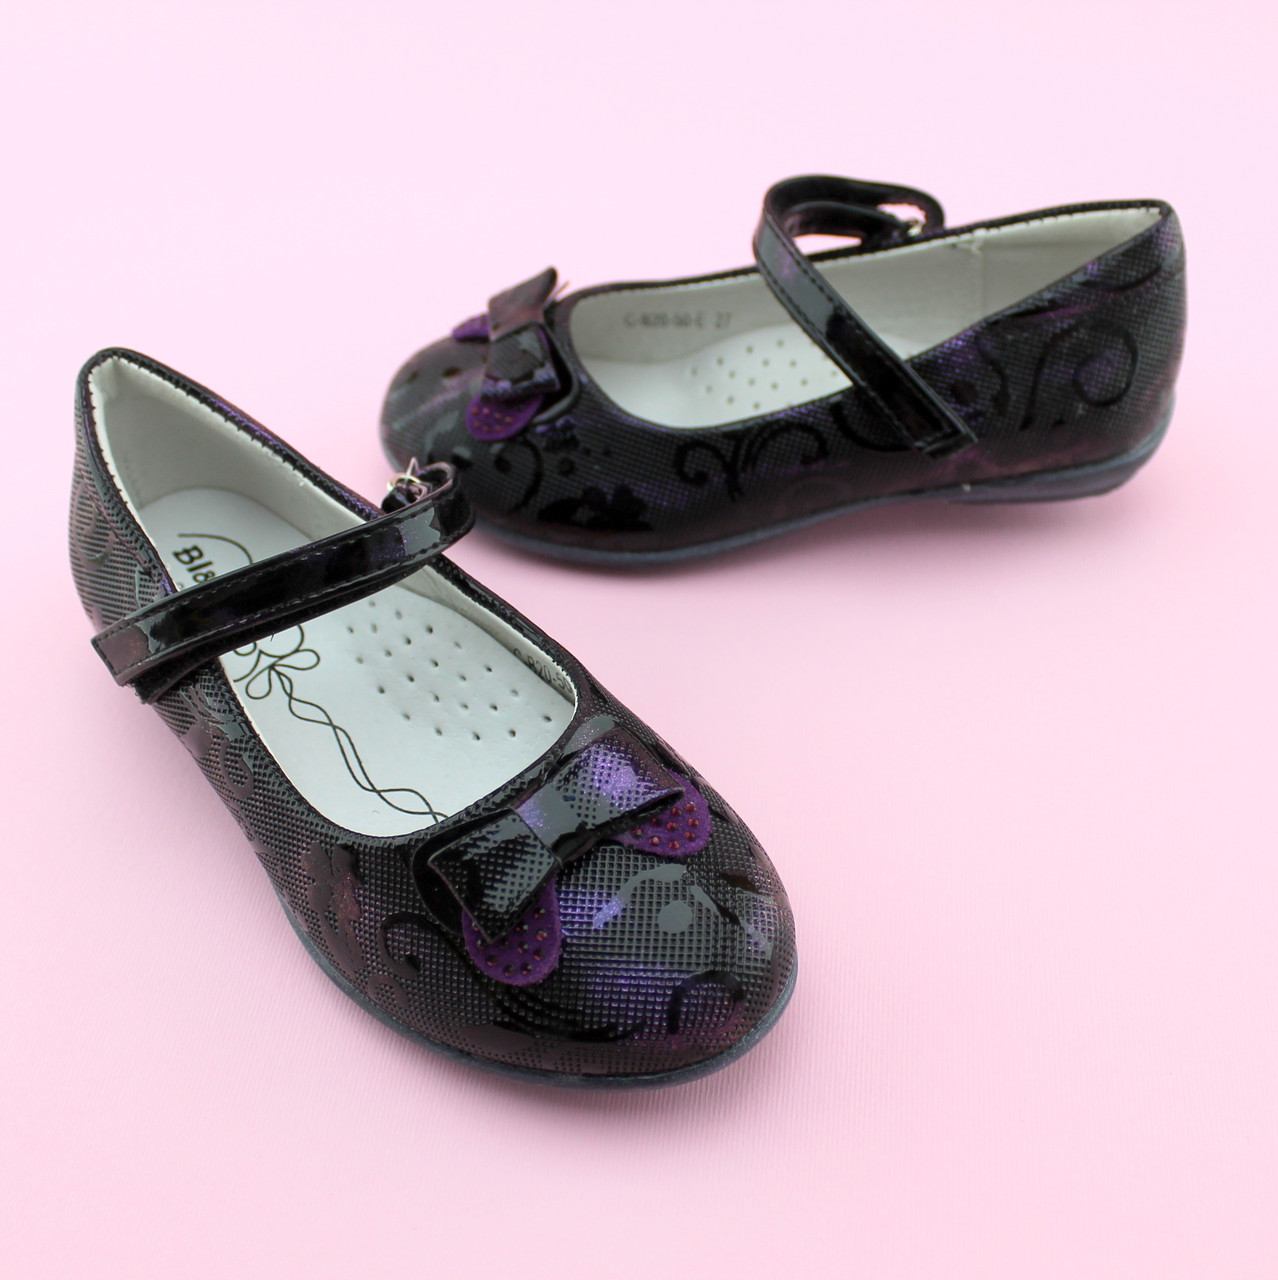 Туфли для девочки Фиолетовые тм BI&KI размер 27,28,29,30,32